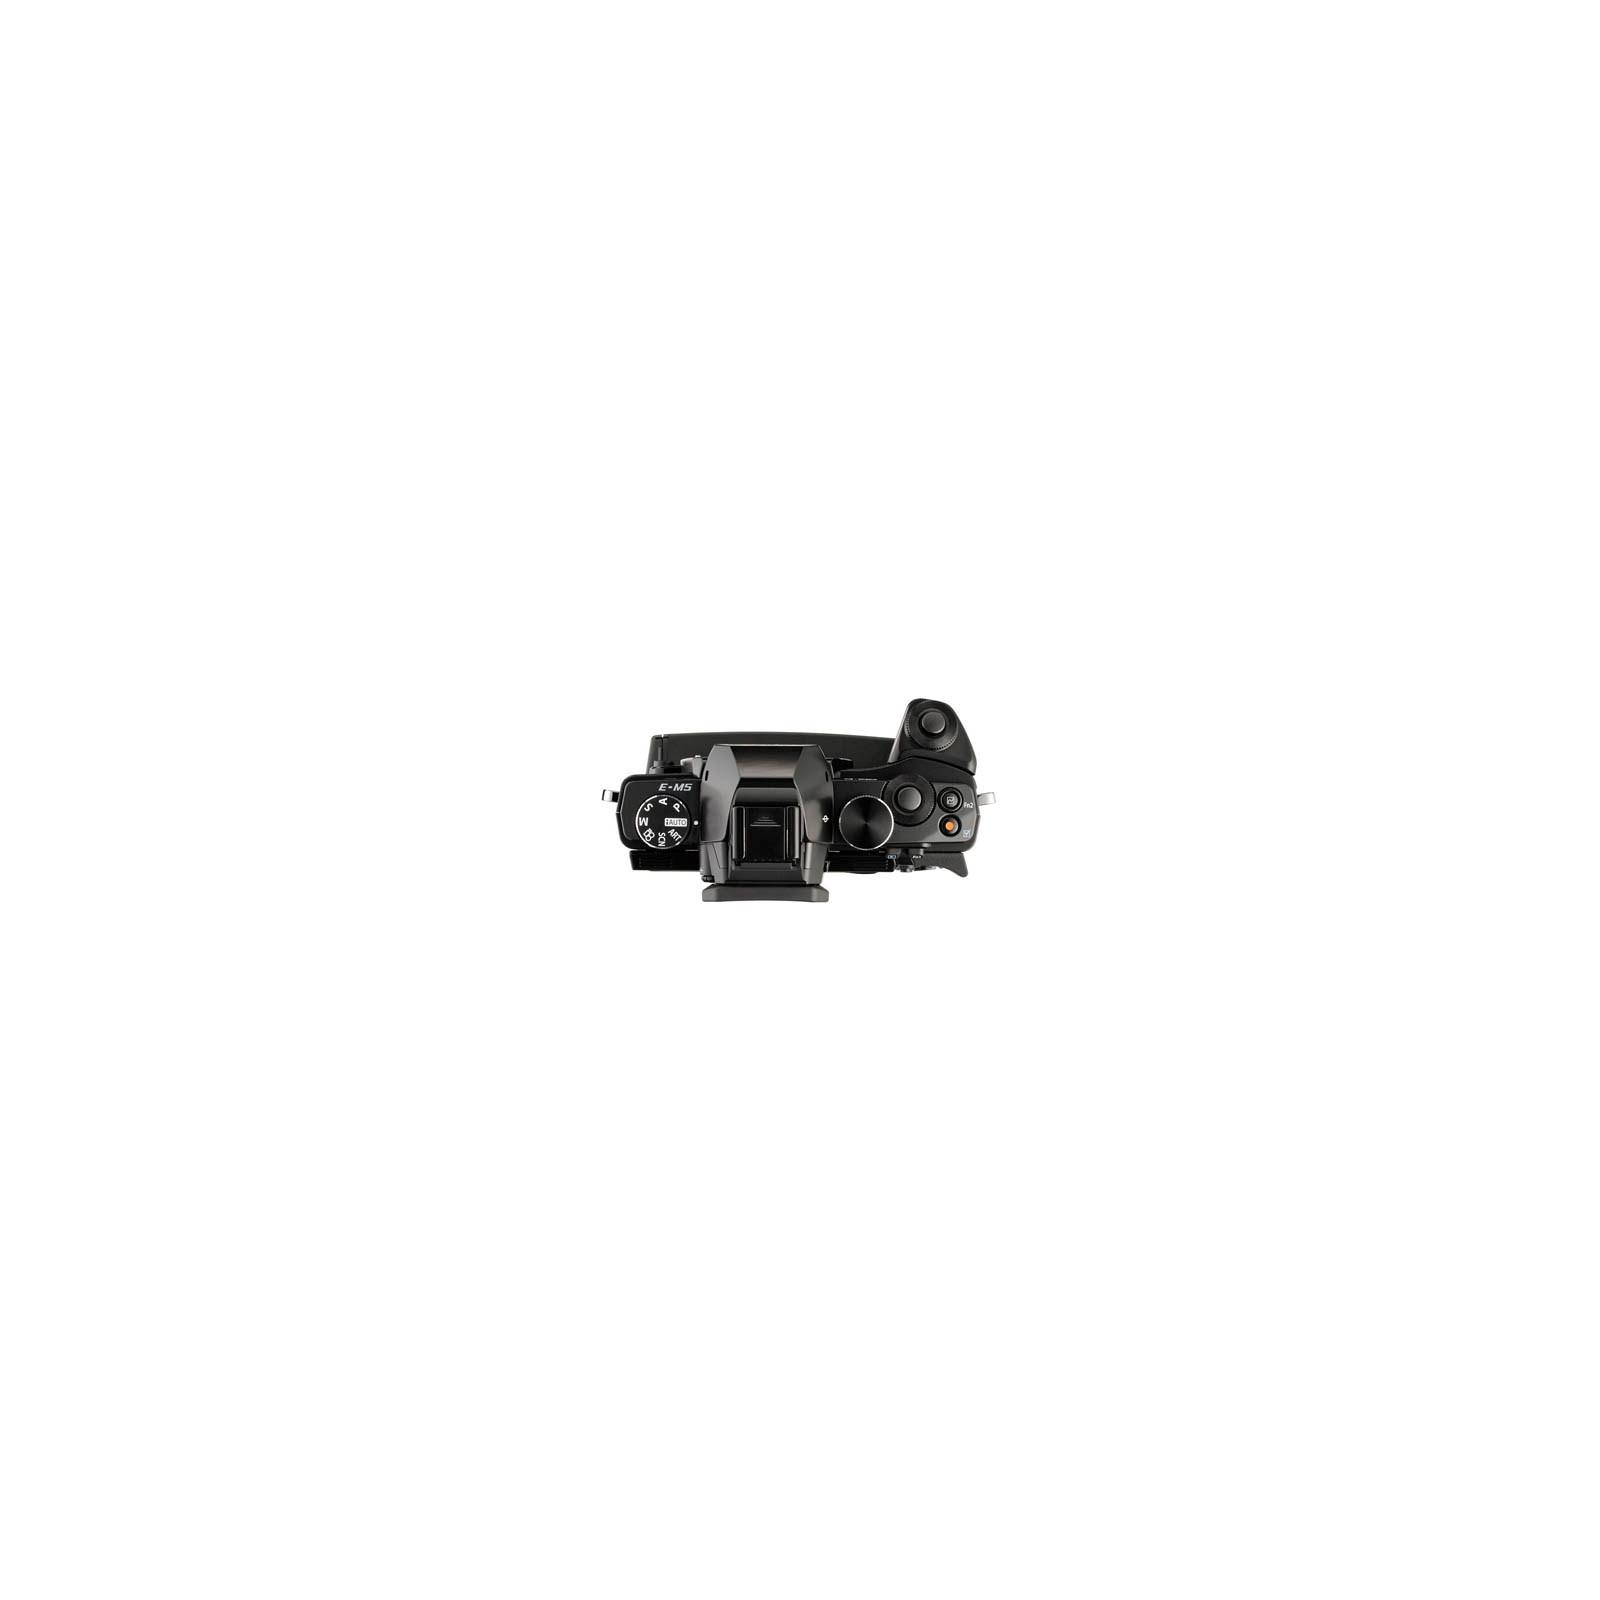 Цифровой фотоаппарат OLYMPUS OM-D E-M5 body black (V204040BE000) изображение 3